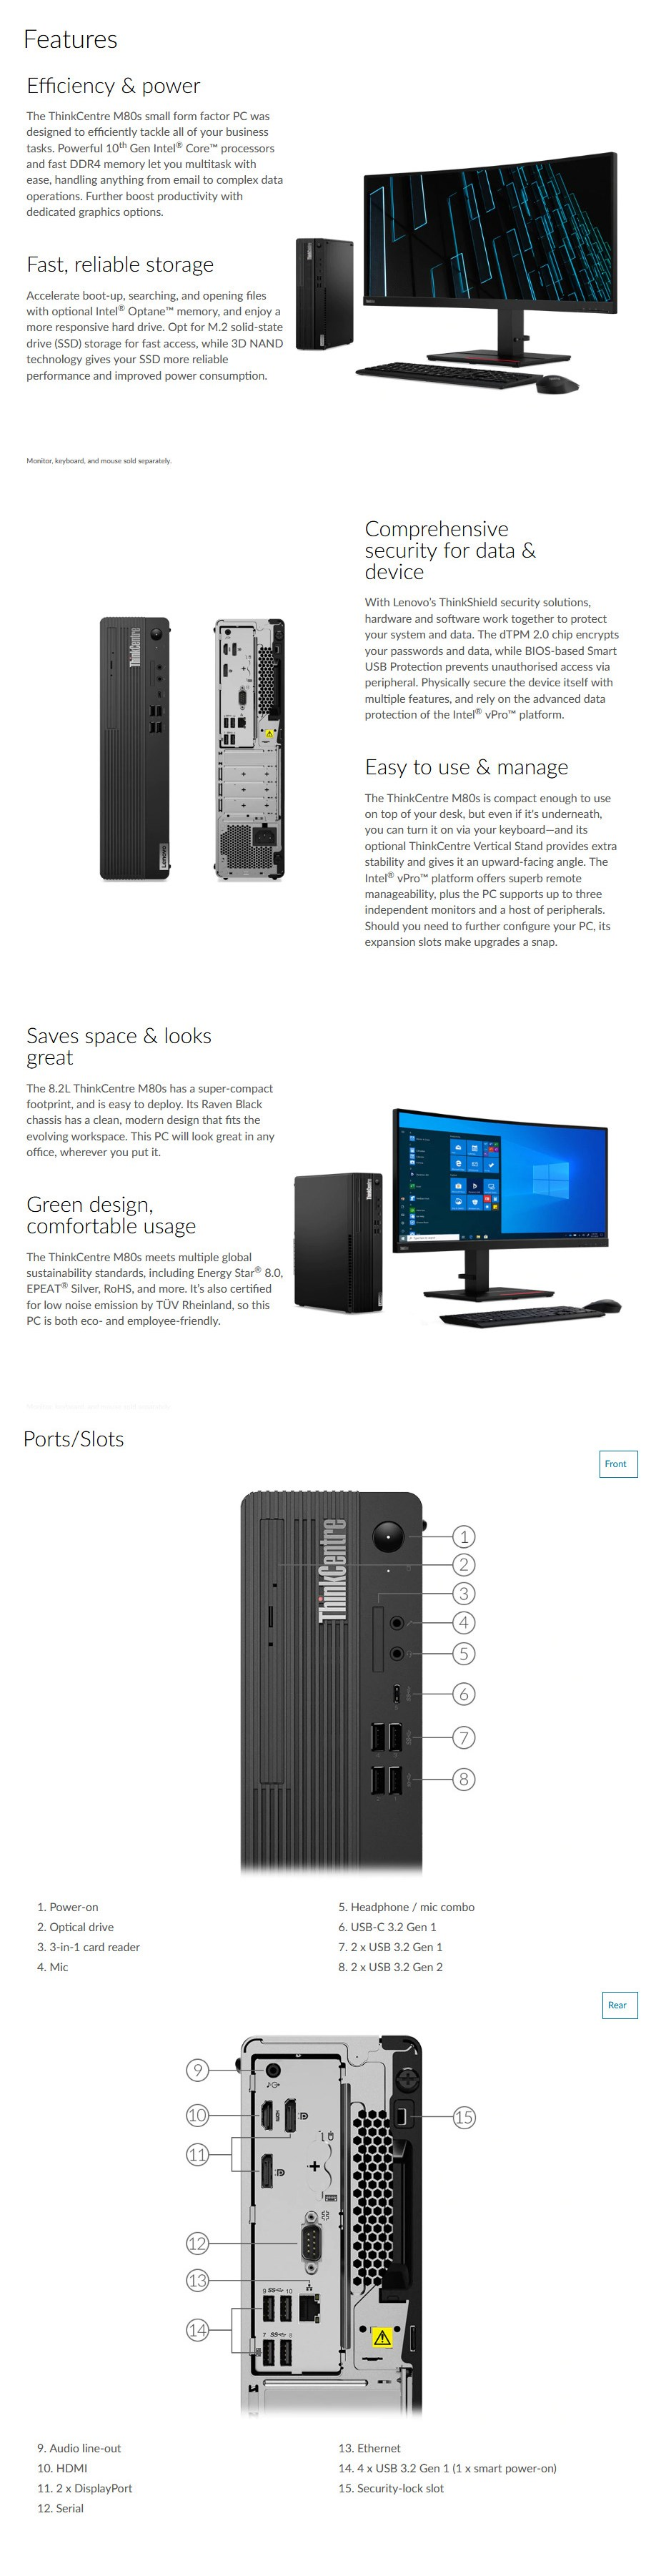 lenovo-m80s-sff-desktop-i510500-8gb-256gb-windows-10-pro-ac41119-5-3-.jpg